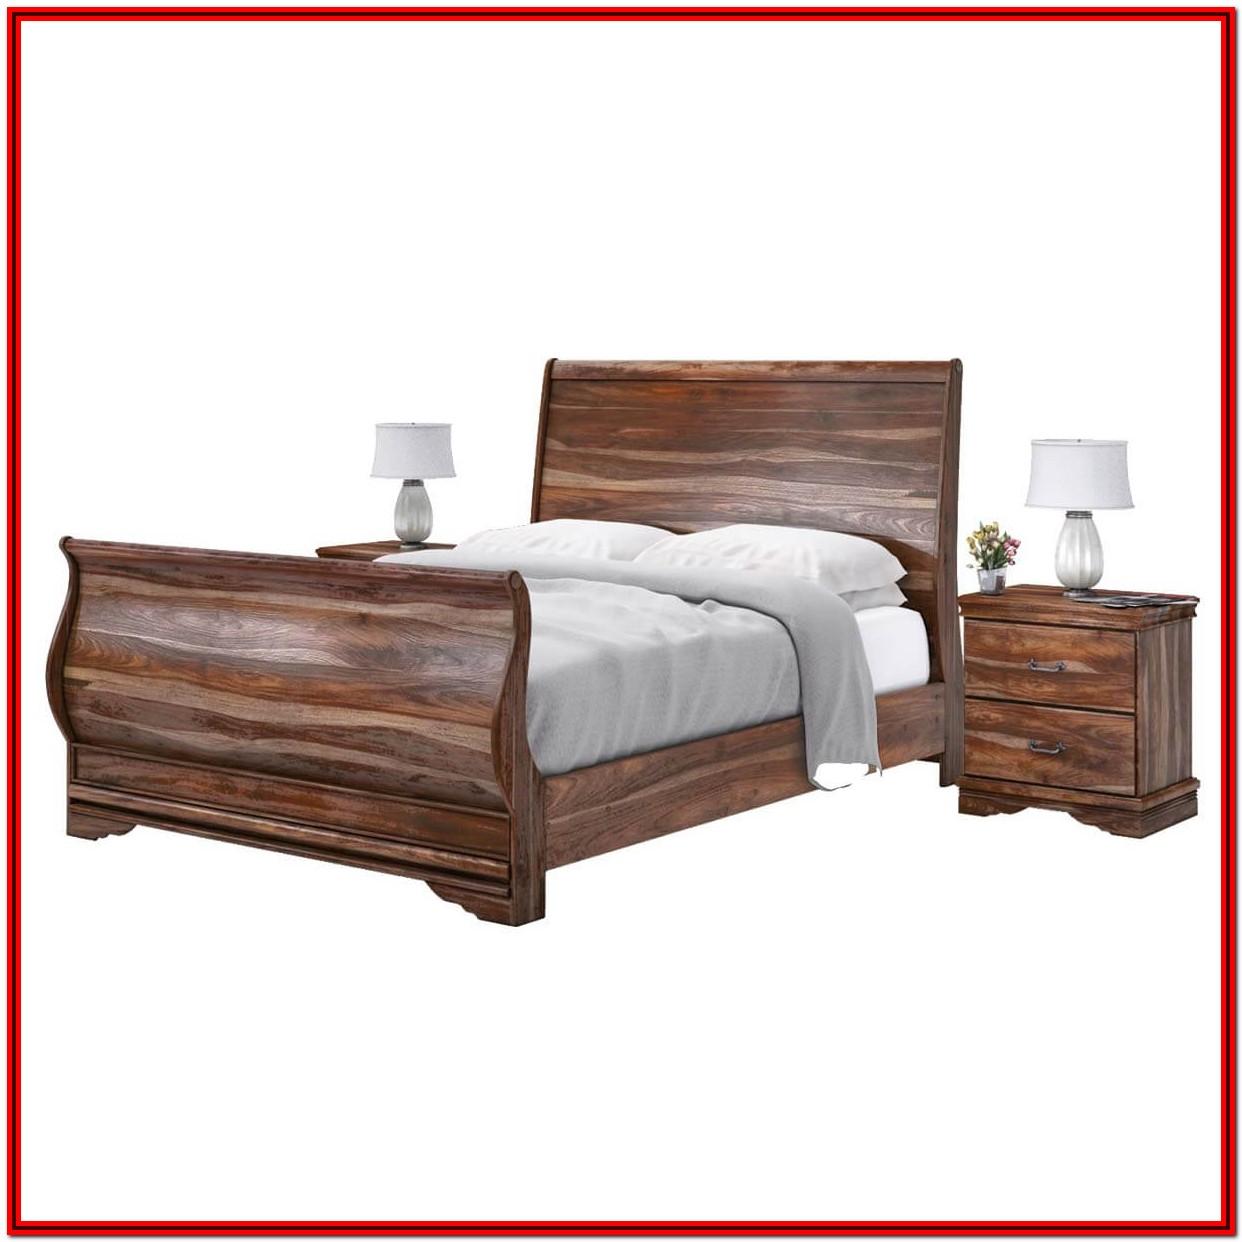 Bed Frame King Size Wood